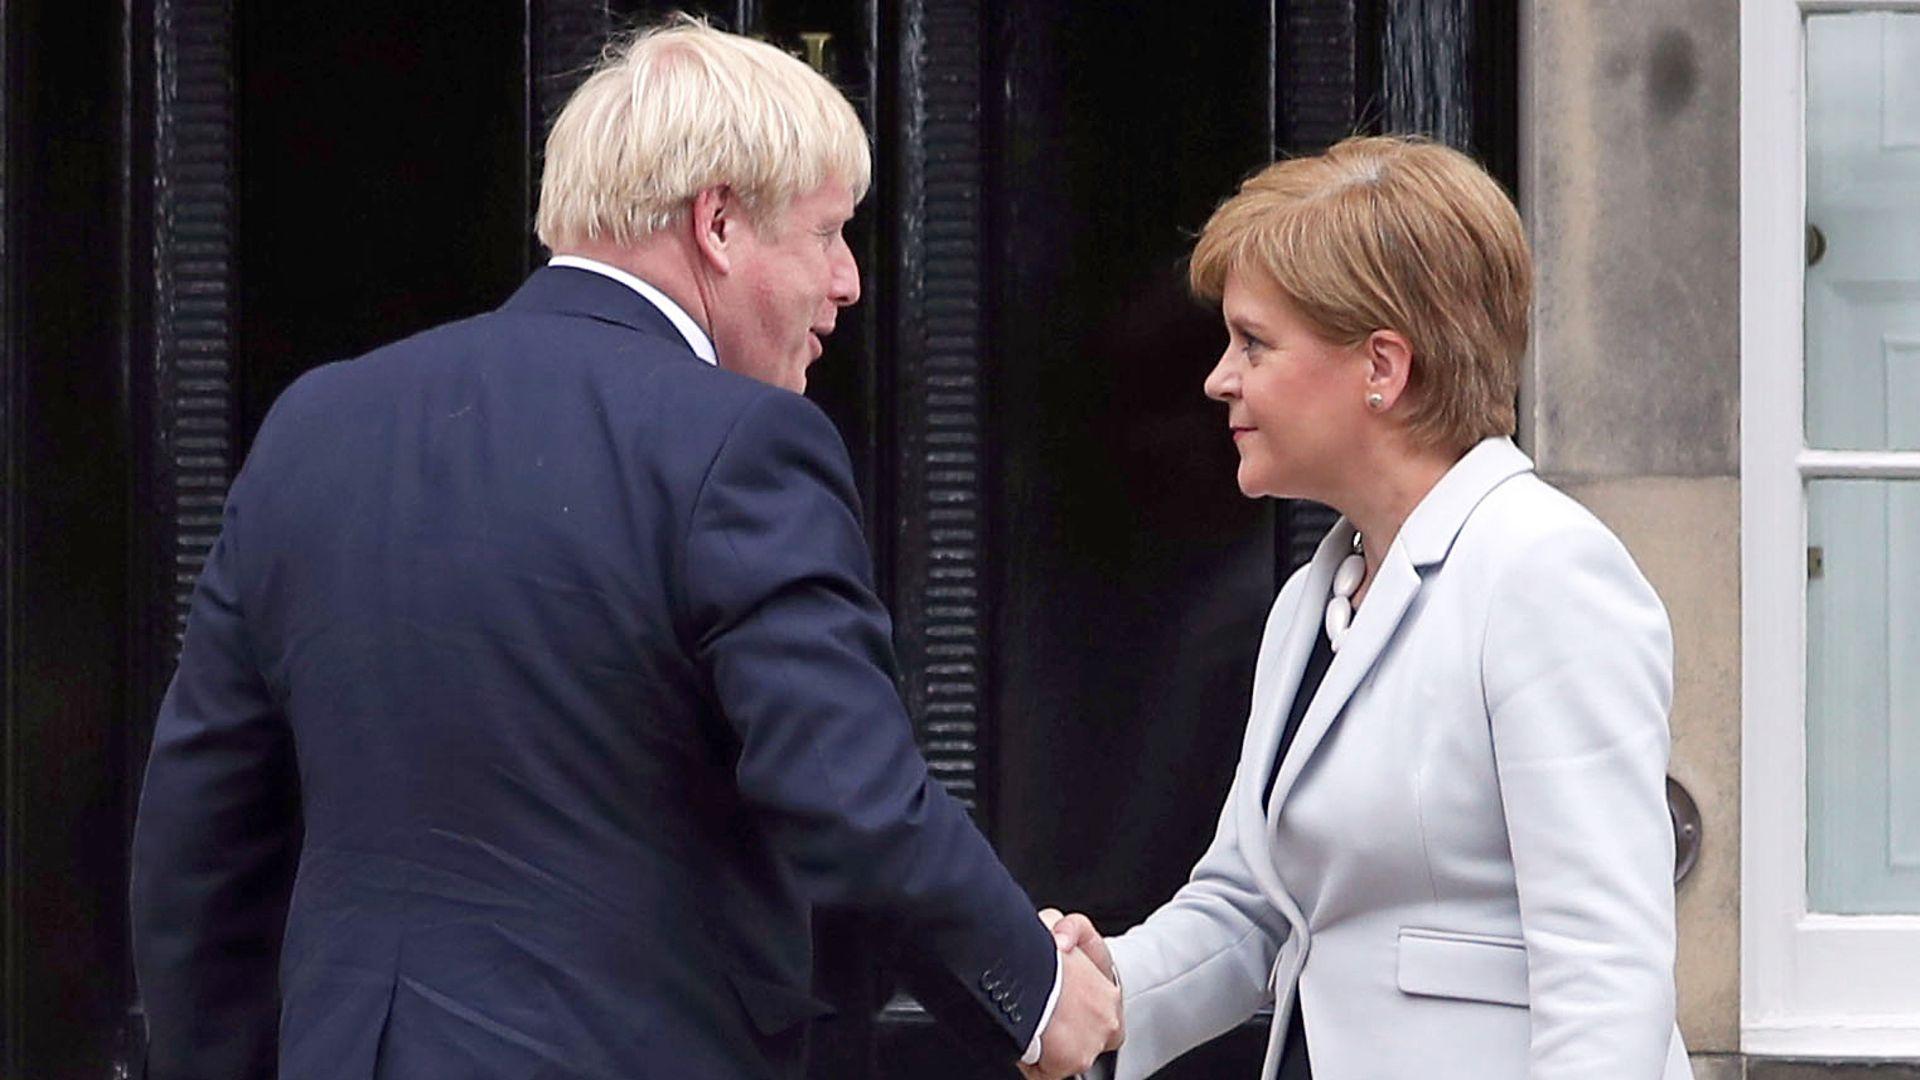 Scotland's first minister Nicola Sturgeon welcoming prime minister Boris Johnson outside Bute House in Edinburgh - Credit: PA